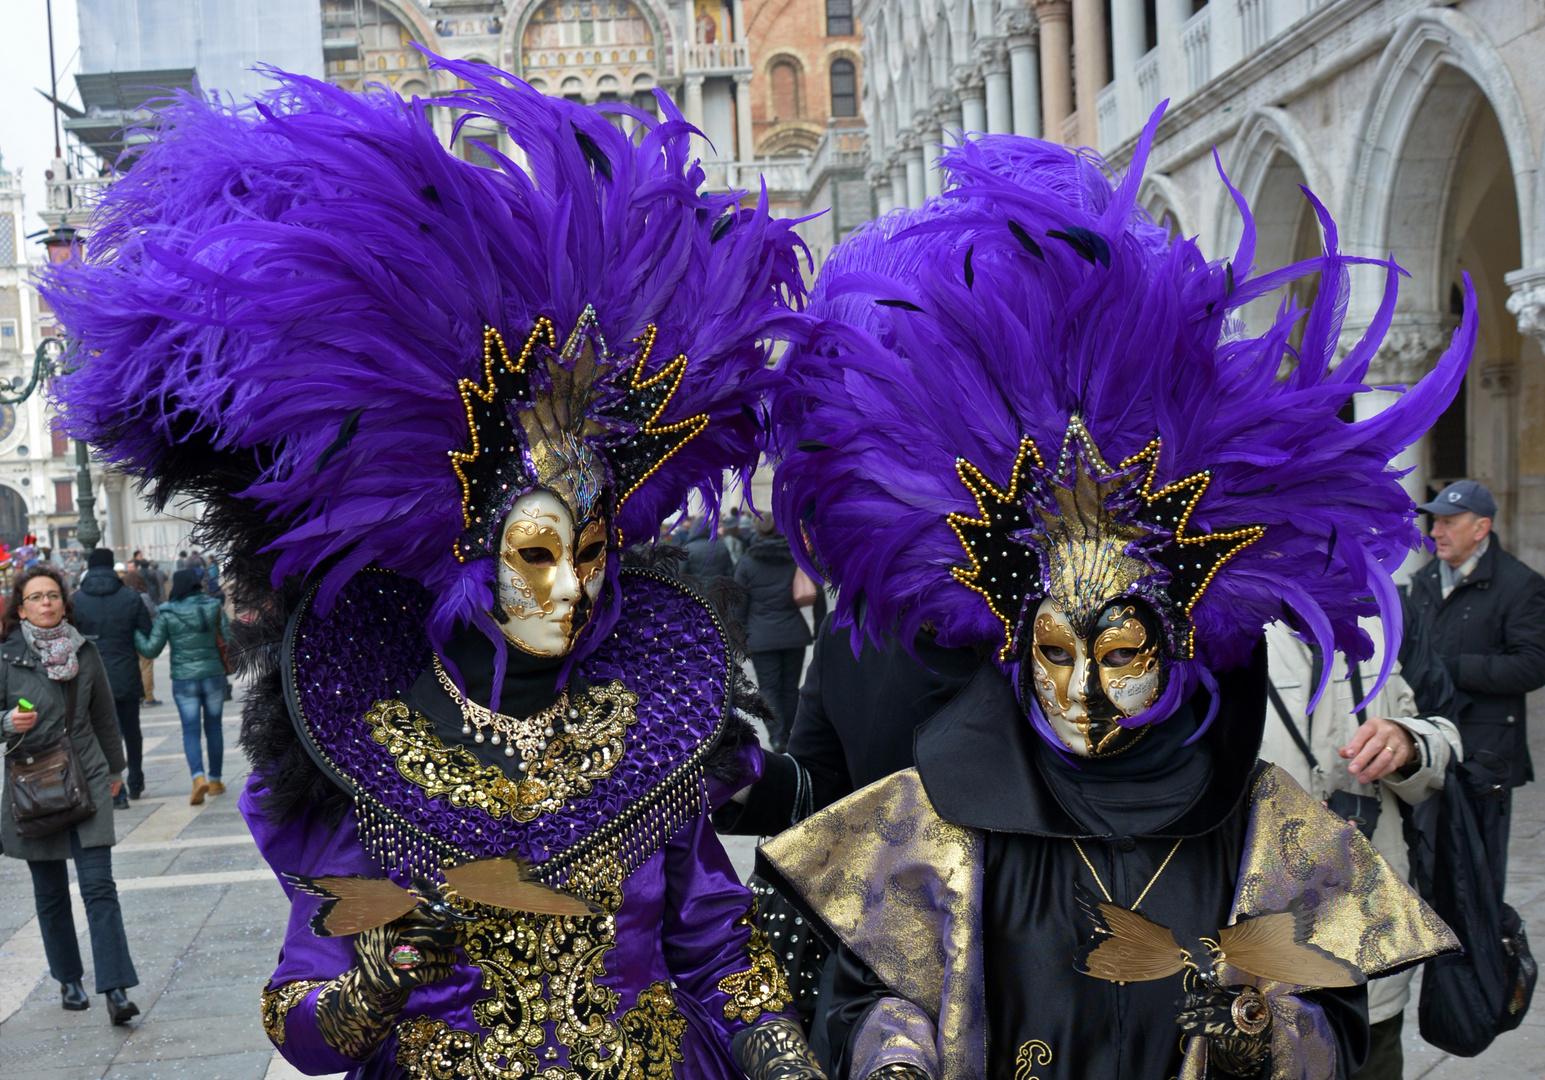 karneval venedig 2013 part 2 foto bild europe italy vatican city s marino italy bilder. Black Bedroom Furniture Sets. Home Design Ideas